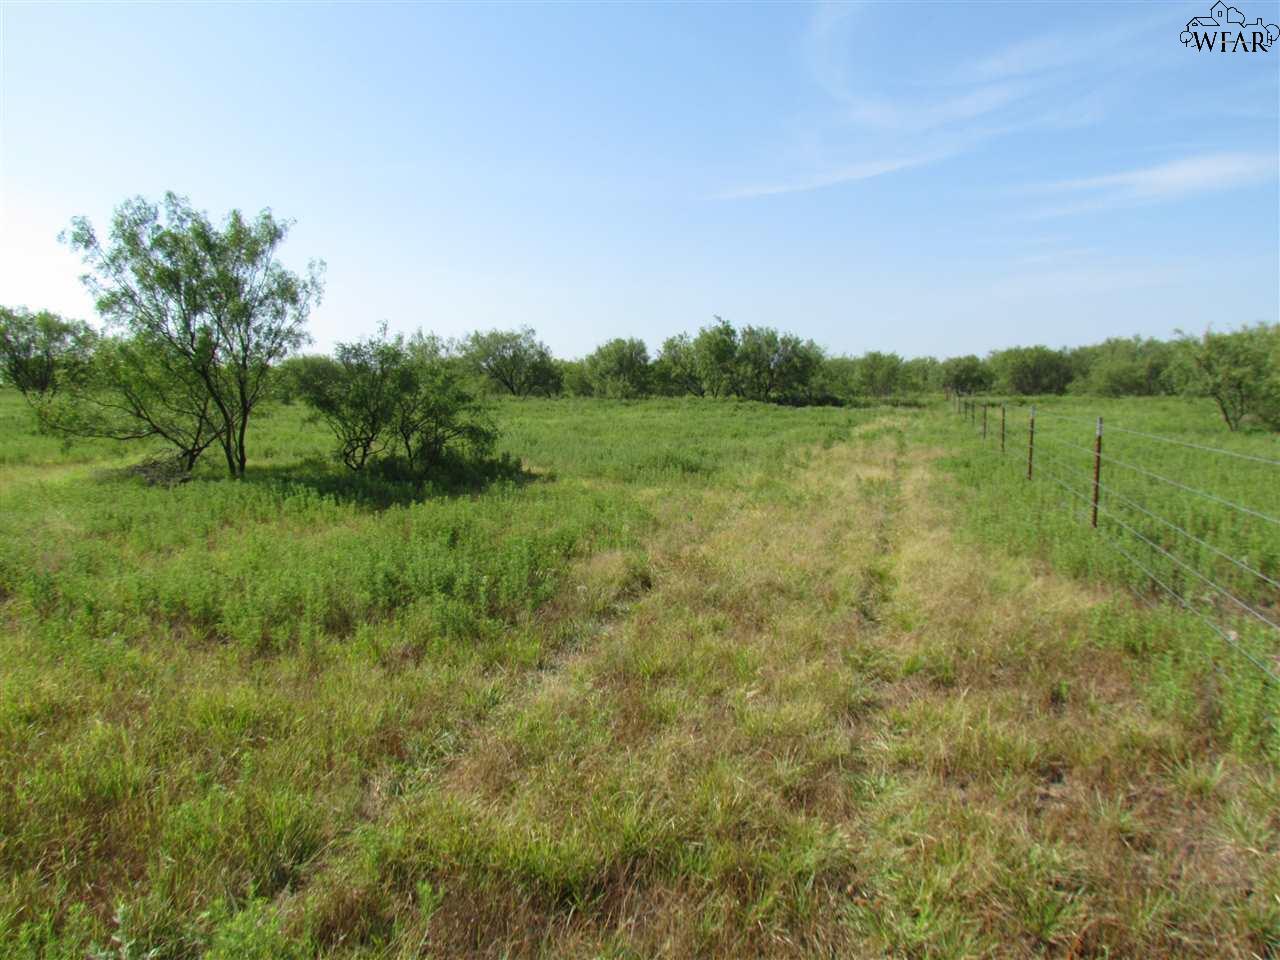 000 BORGMAN ROAD, Henrietta, TX 76365